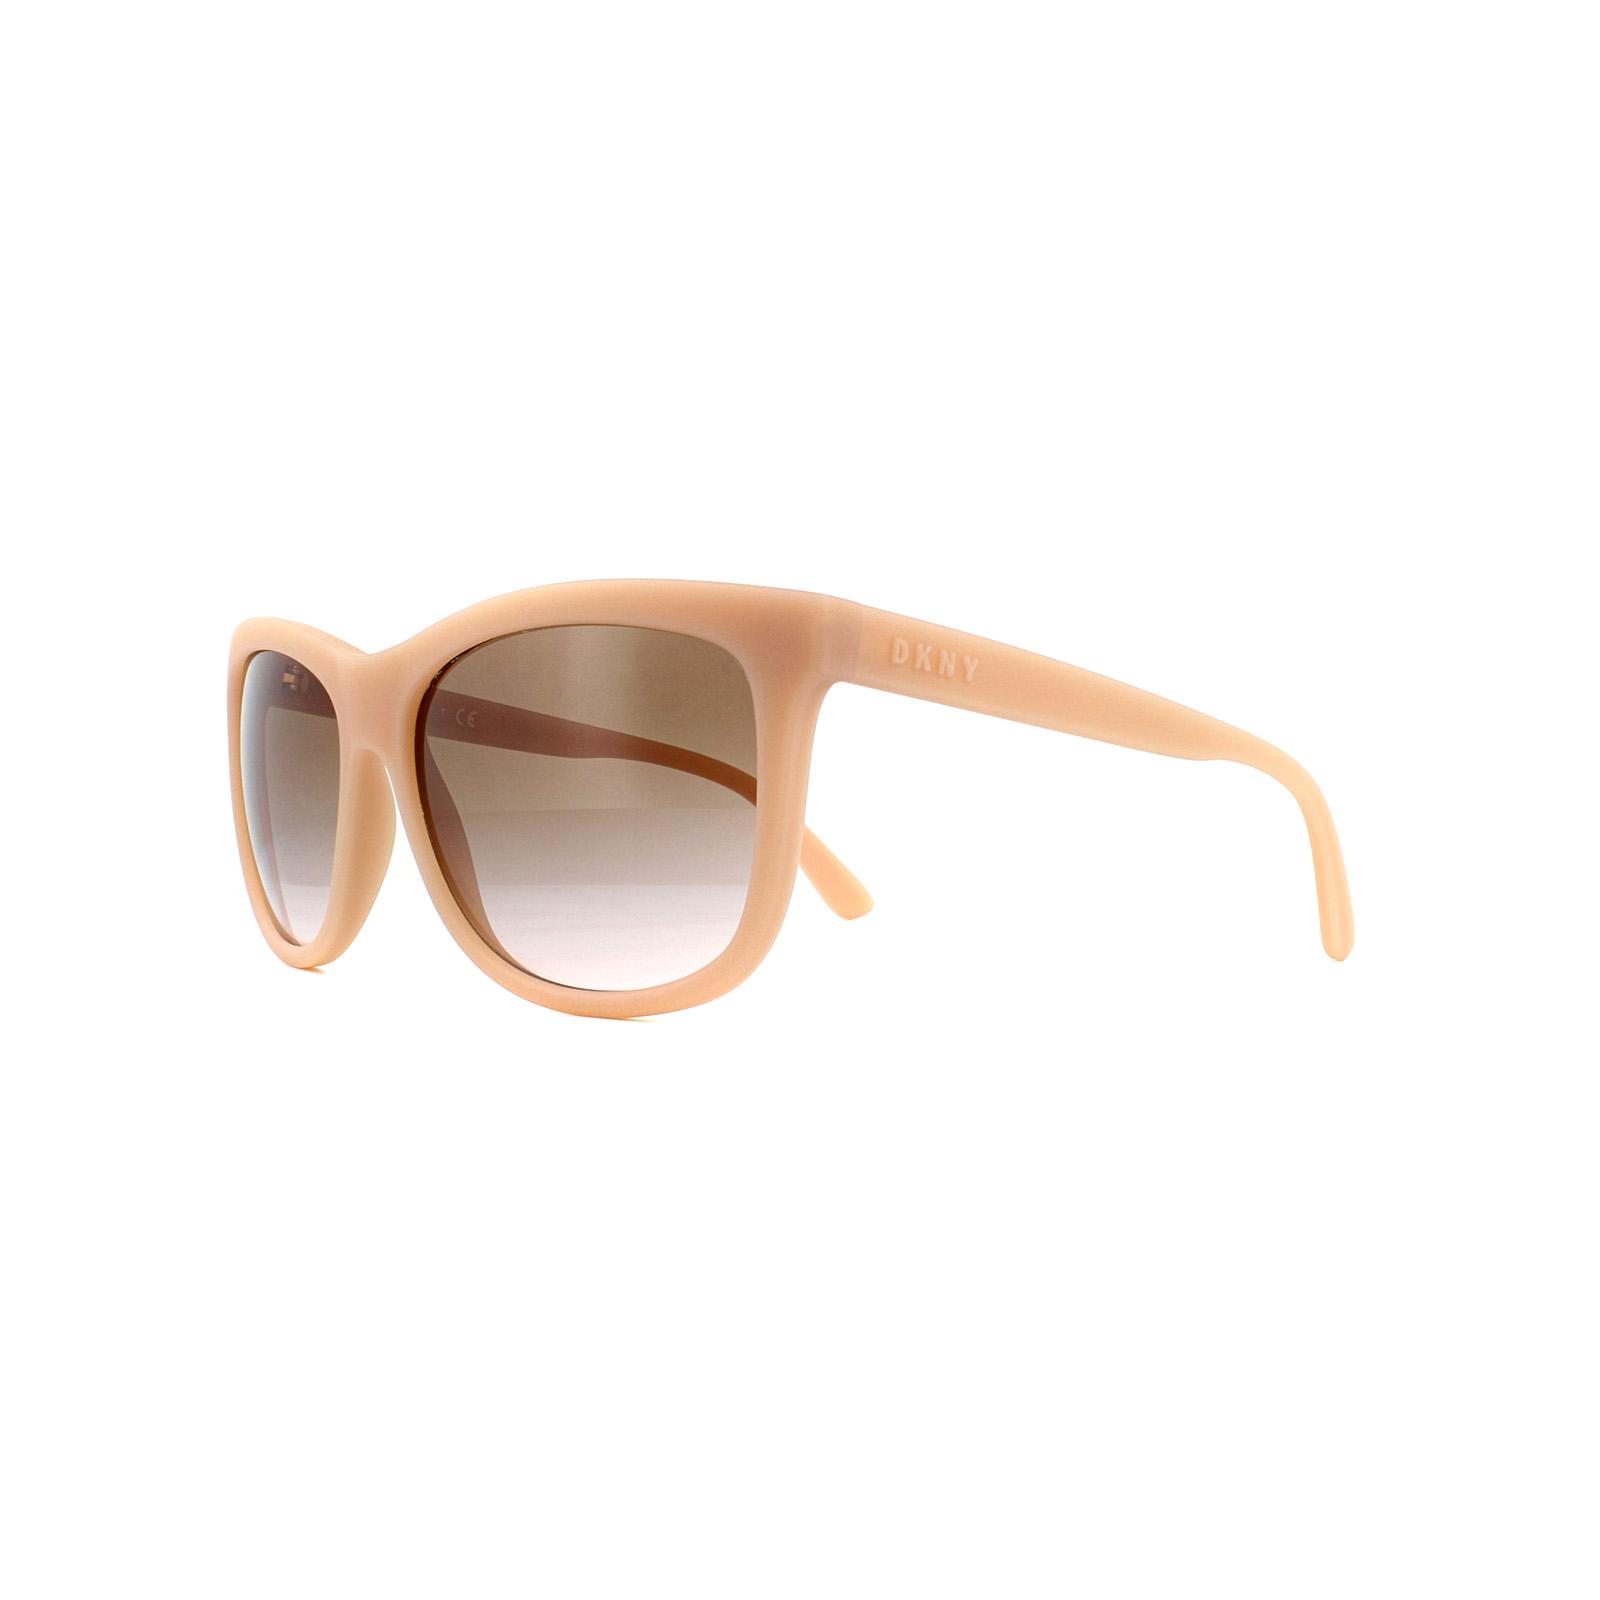 b22783f59e3a Cheap DKNY DY4152 Sunglasses - Discounted Sunglasses